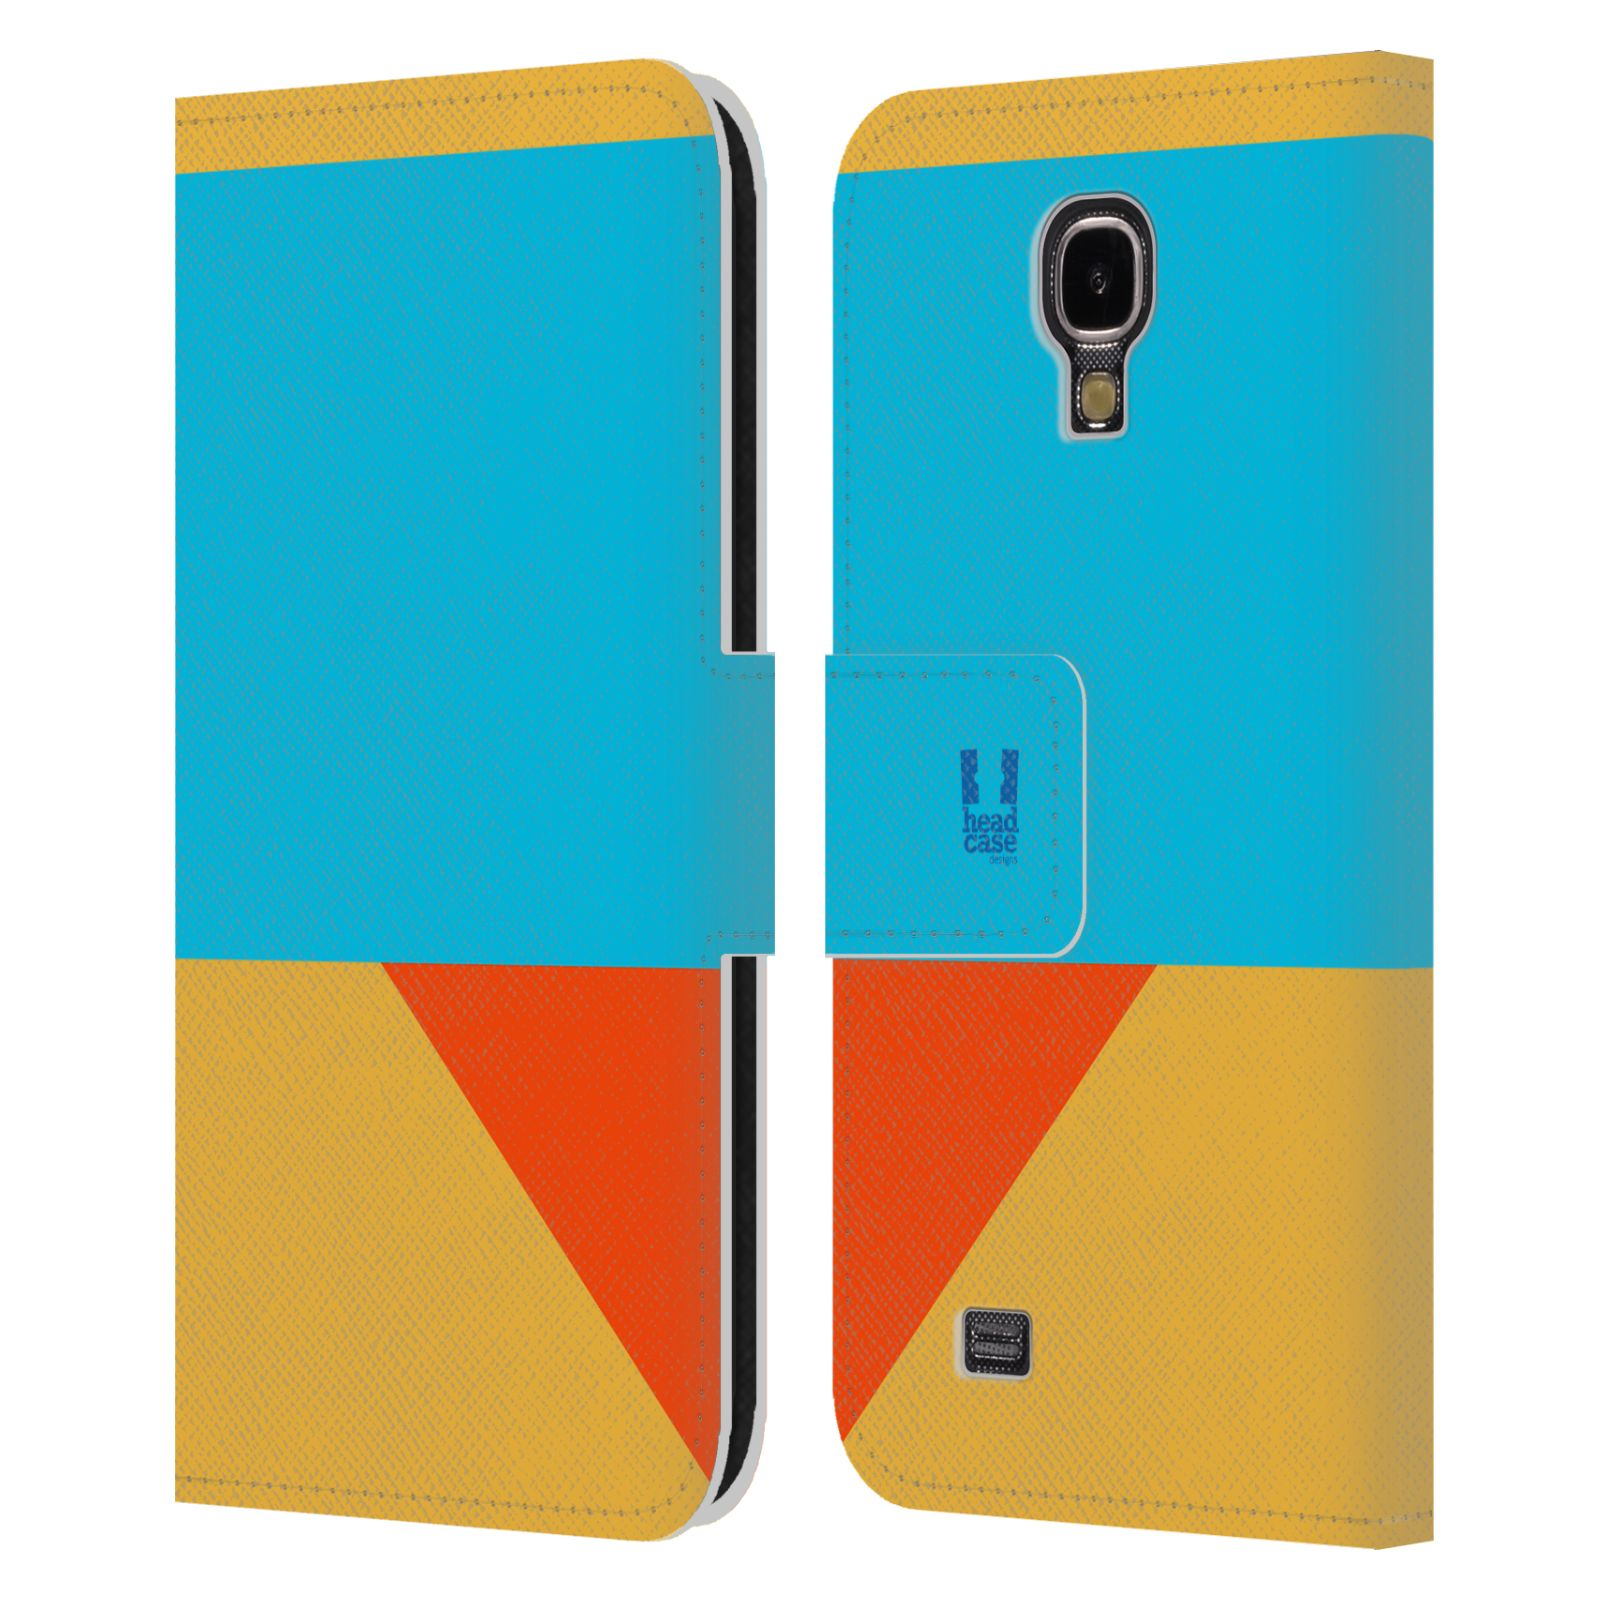 HEAD CASE Flipové pouzdro pro mobil Samsung Galaxy S4 I9500 barevné tvary béžová a modrá DAY WEAR